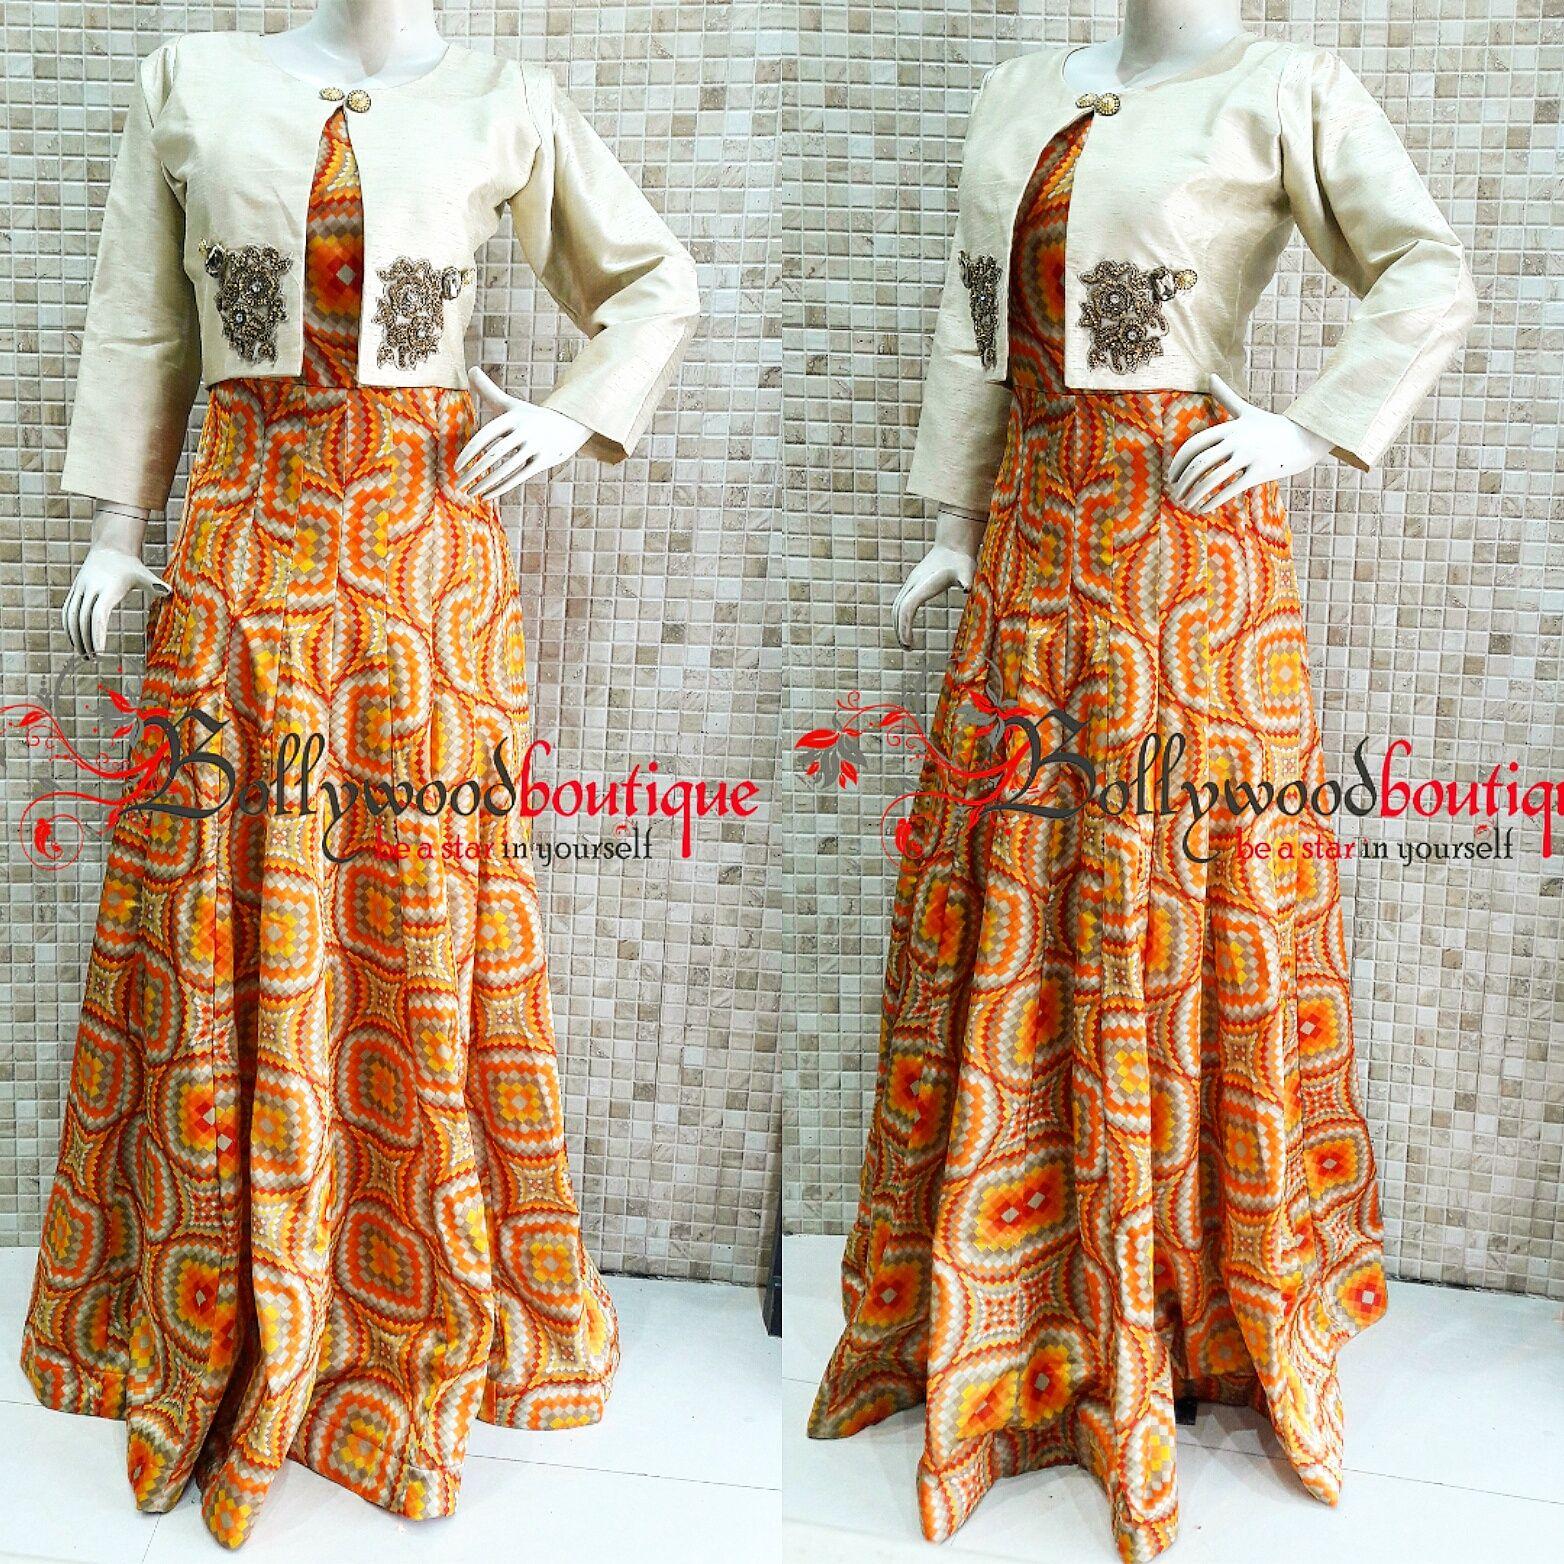 68d89b836049 Simple   Unique Designer Dress With Short Jacket   Minimal Embroidery   Designer Wear  Short Jacket  Dresses  Party Wear  Minimalism   BollywoodBoutique ...